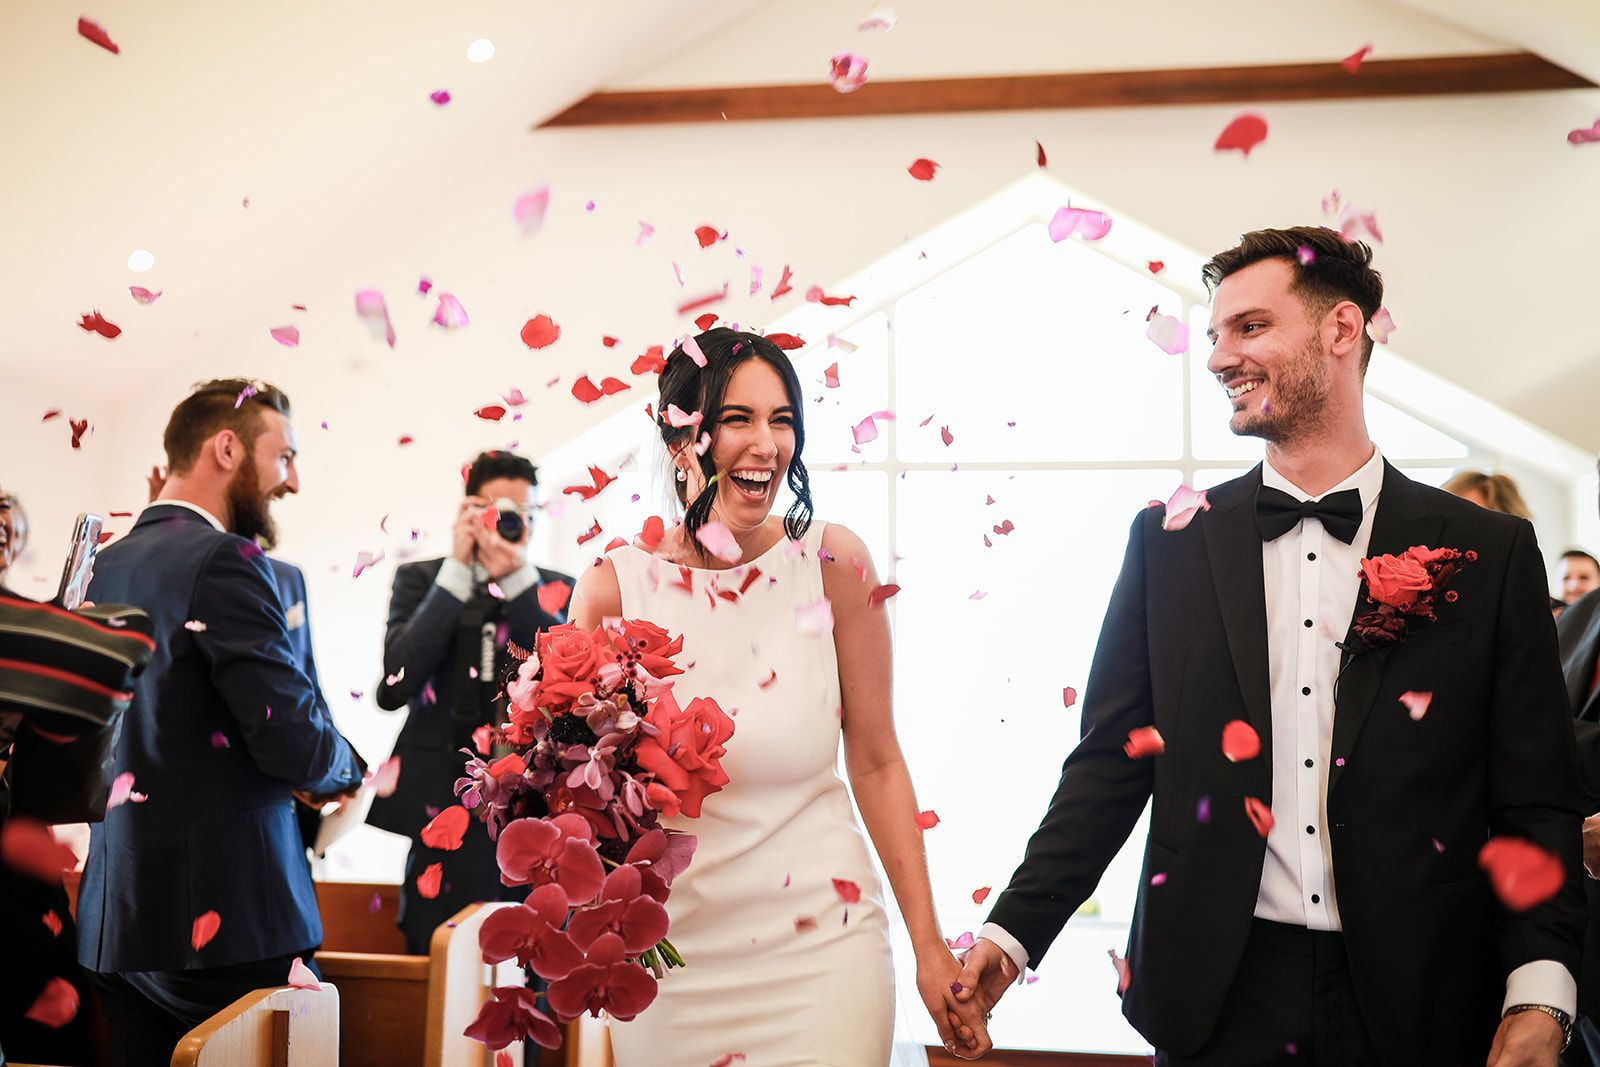 NICK & LAURA'S WEDDING (With images) Wedding stylist